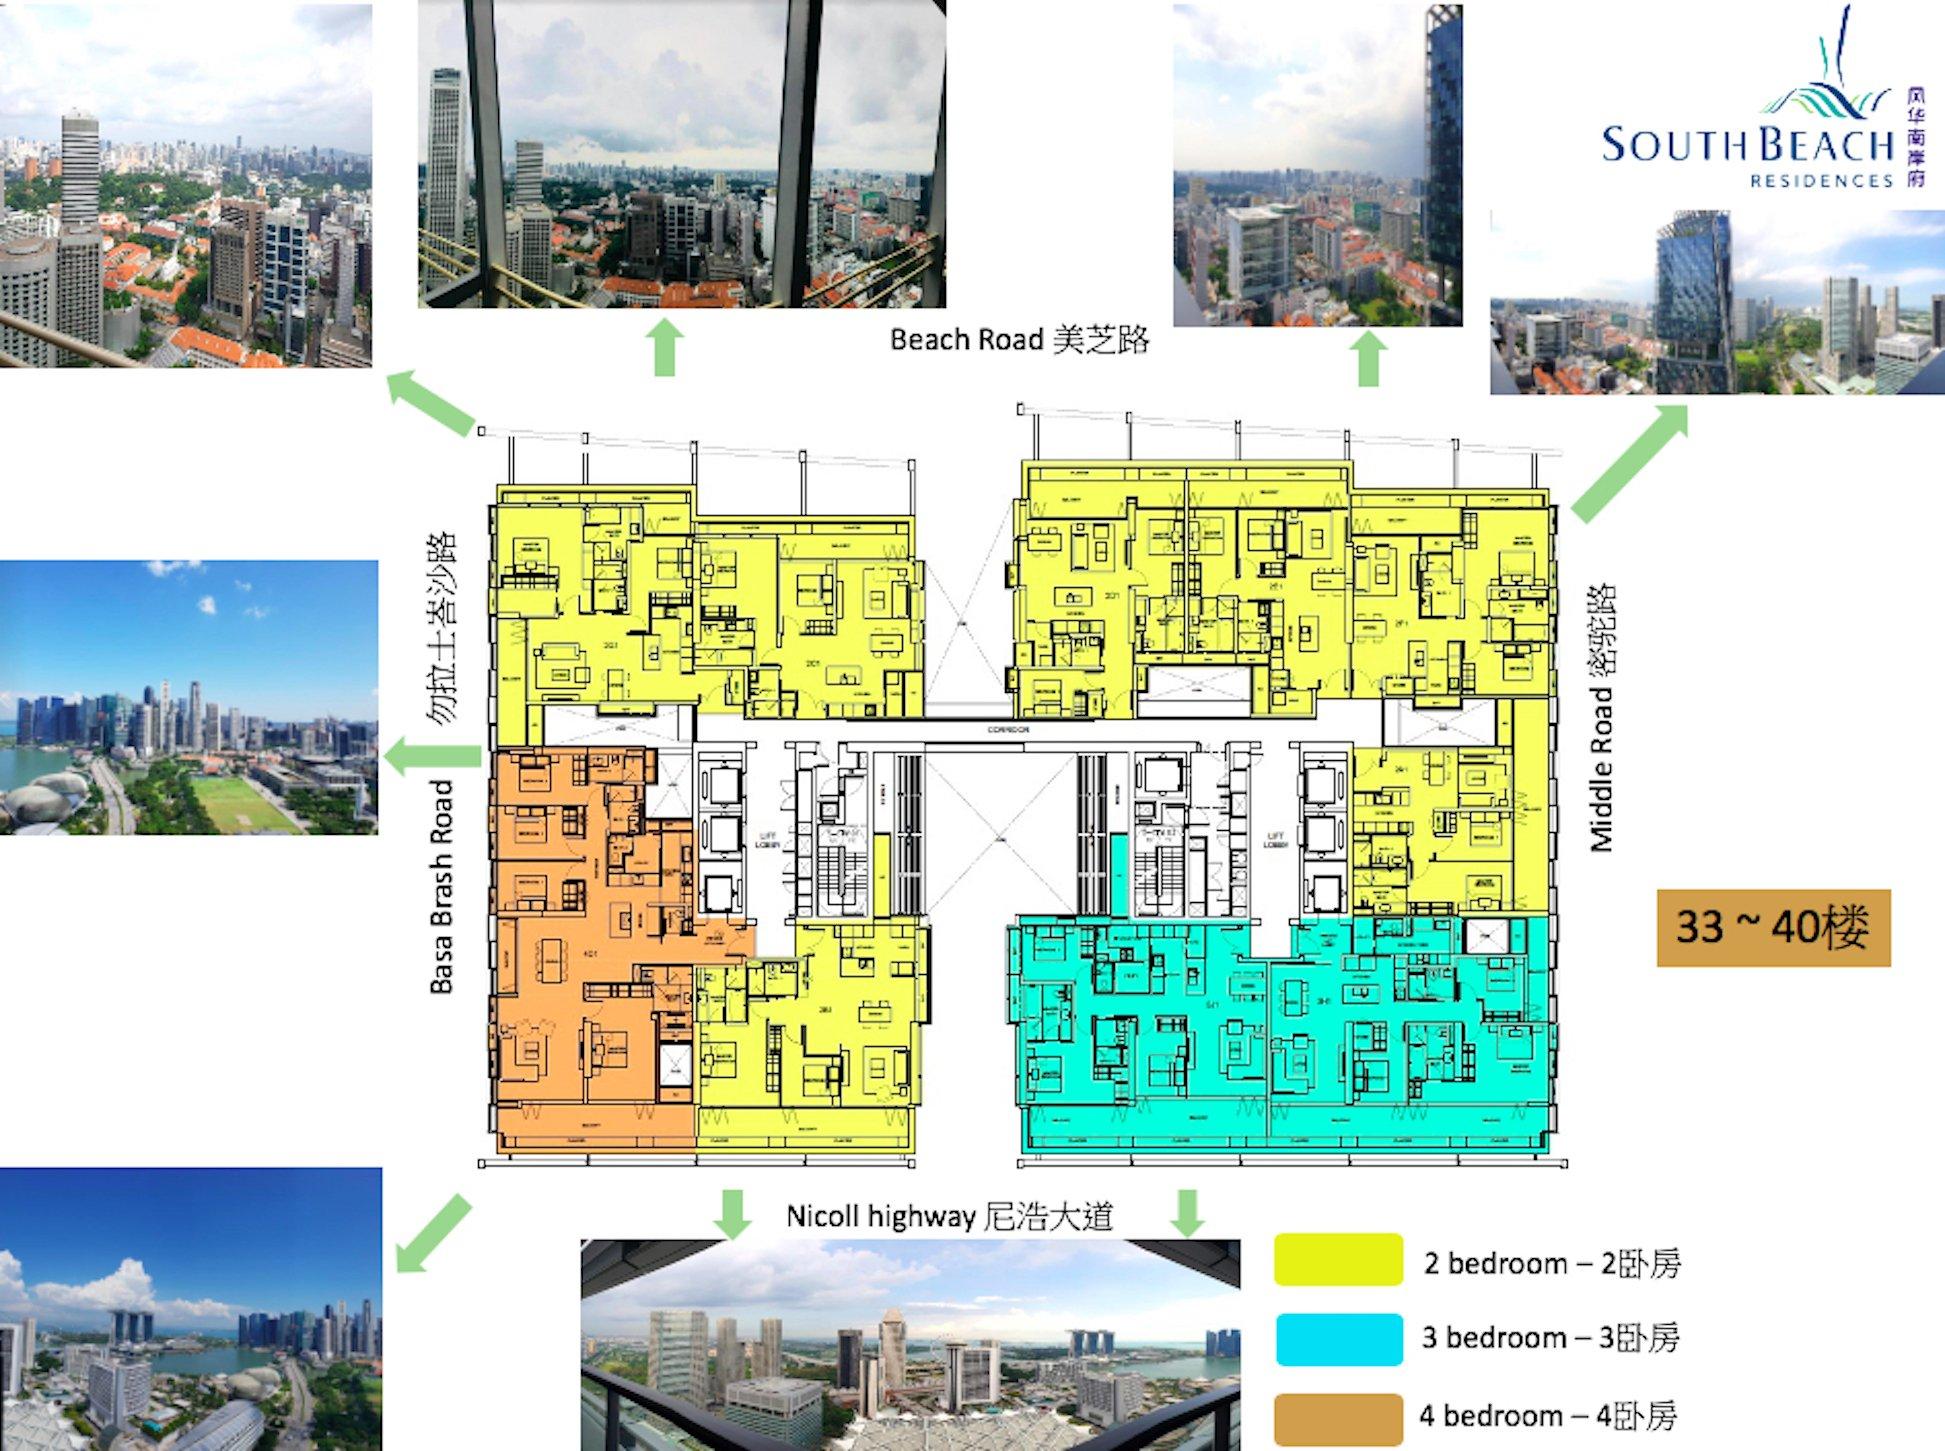 South Beach Residences-风华南岸府33-40楼户型方向区位图